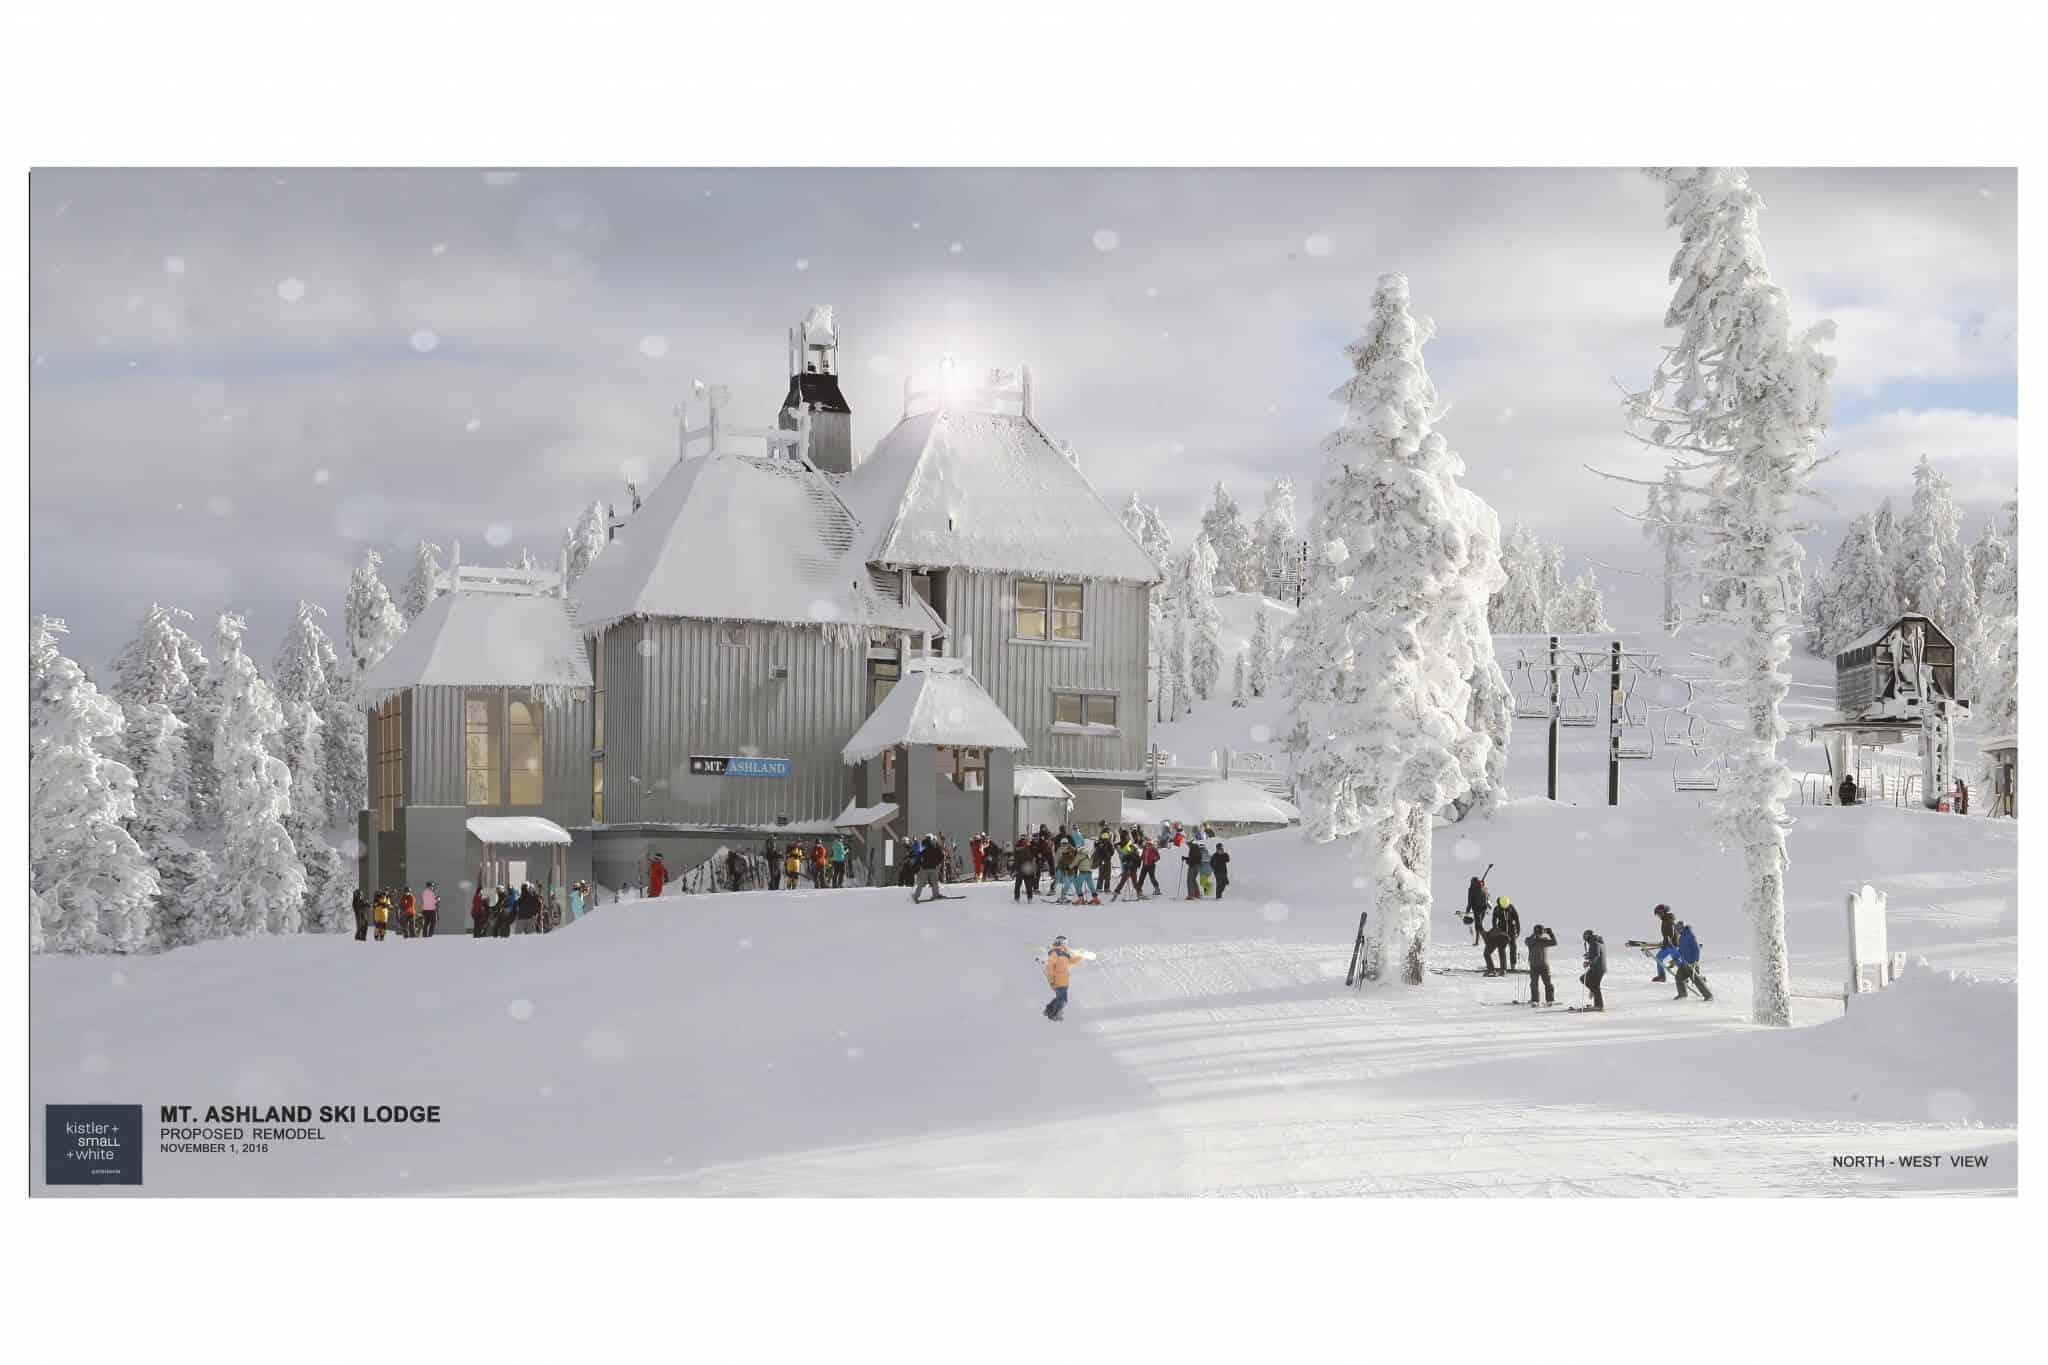 Support Mt. Ashland's 2017 Lodge Improvements Campaign